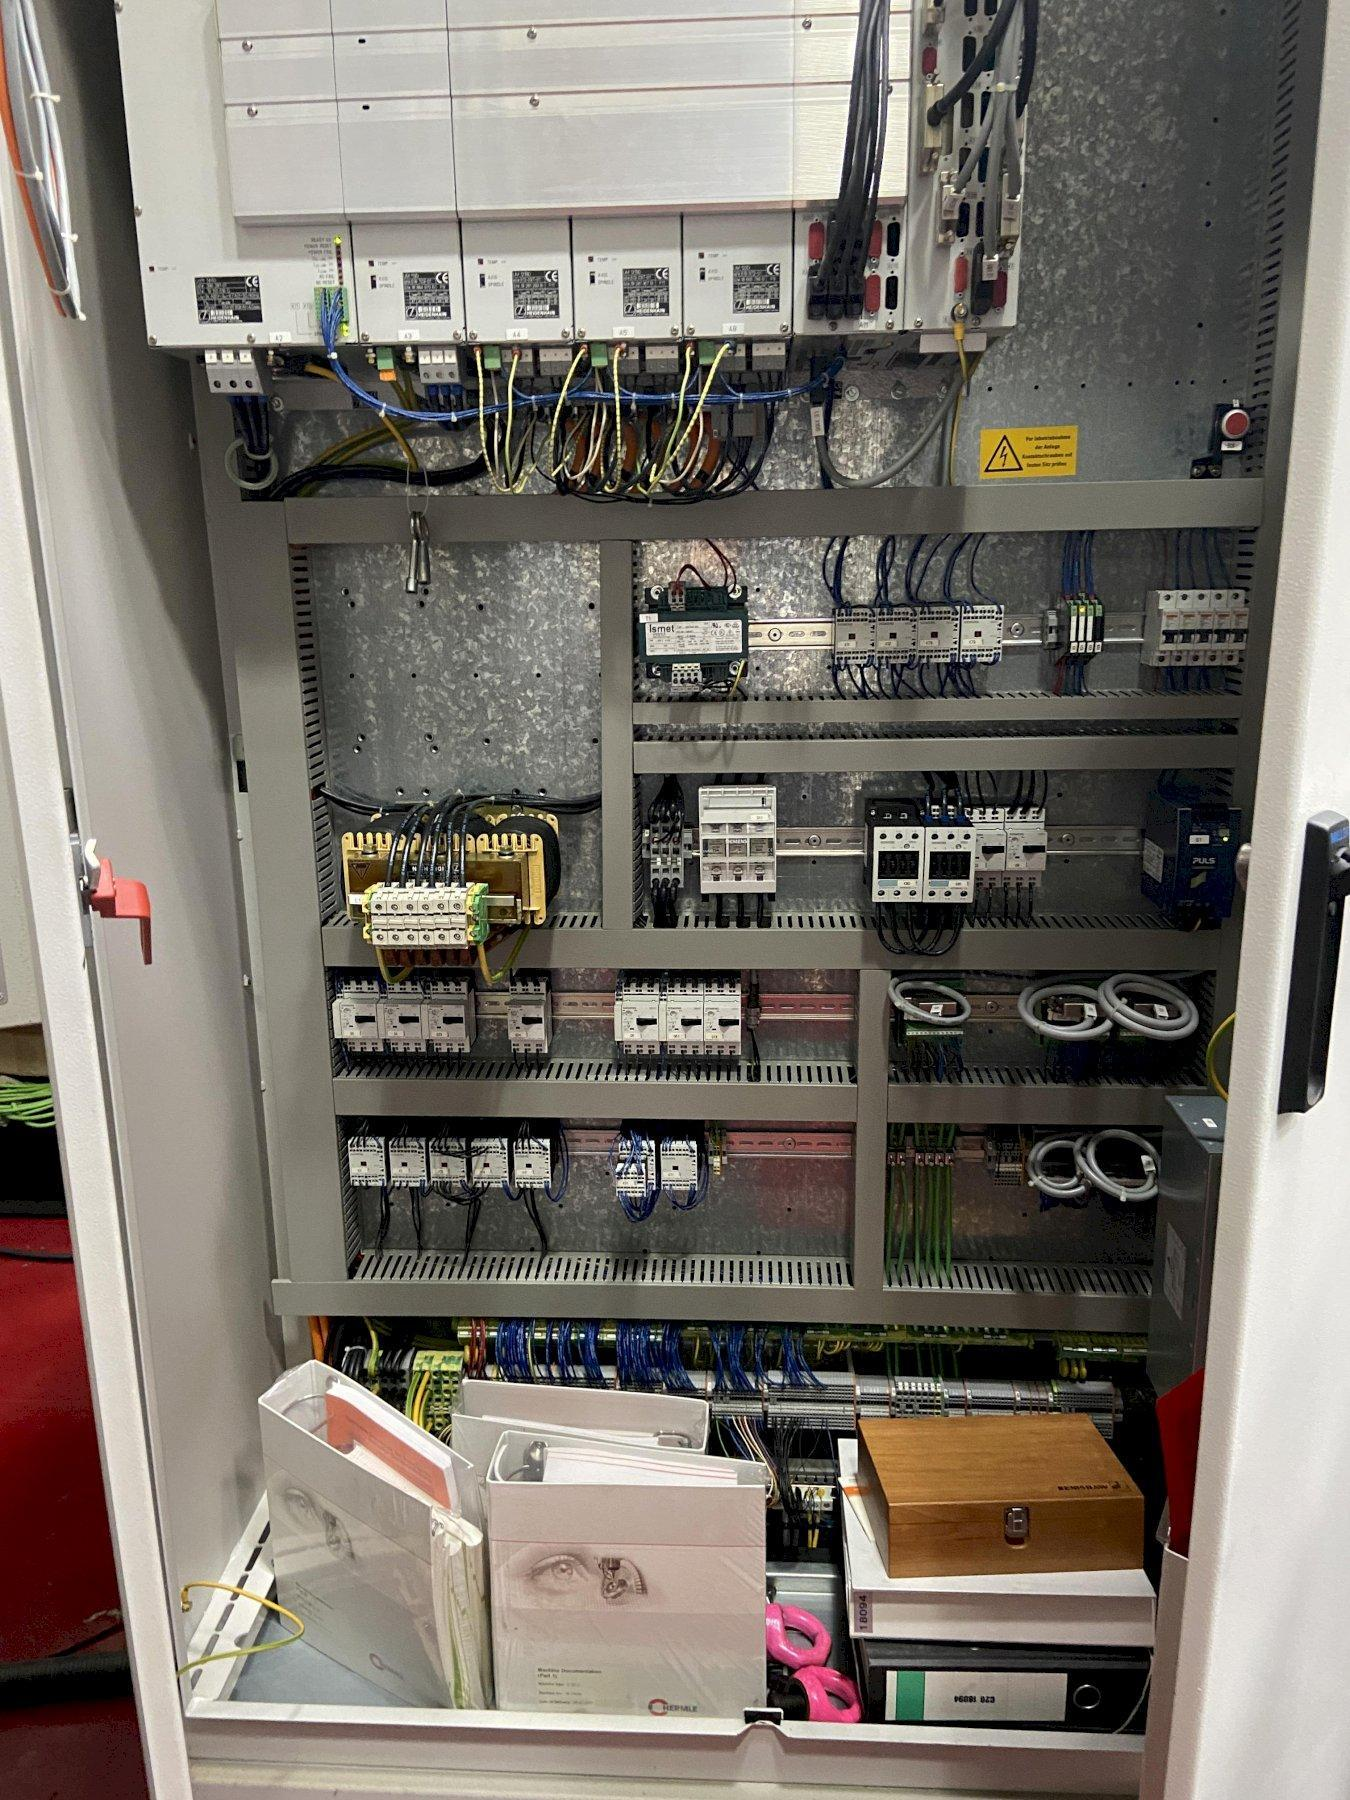 "Hermle C20U 5-Axis CNC Vertical Machining Center, Heidenhain TNC530, 11"" Table Dia, 24""/18""/18"" Travels, 18K Spindle, 30 ATC, Probe, Chiller, 54 HP, 2007"